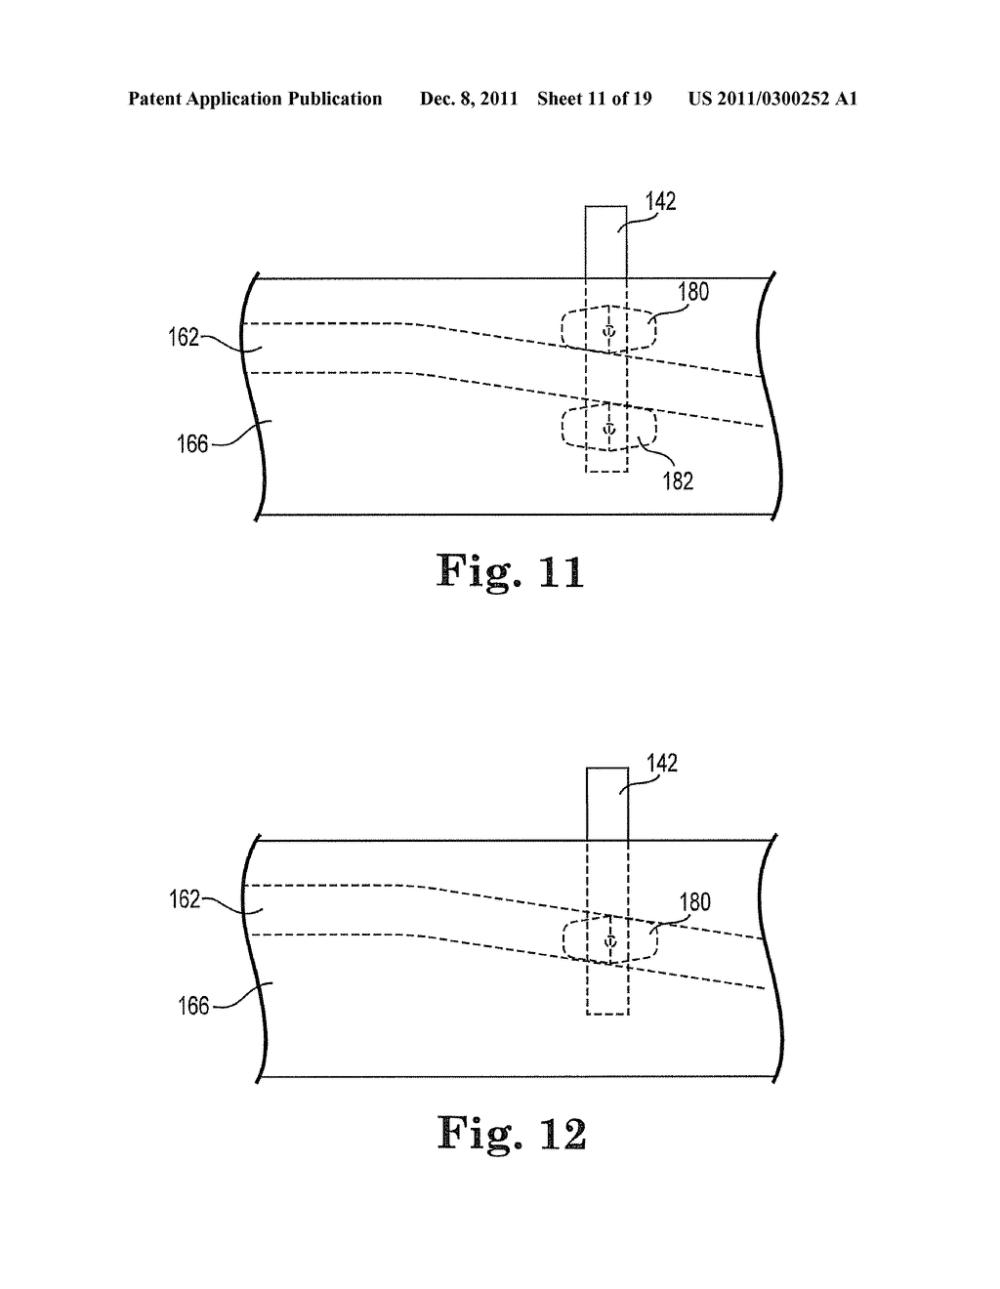 medium resolution of concrete block machine having a controllable cutoff bar diagram schematic and image 12